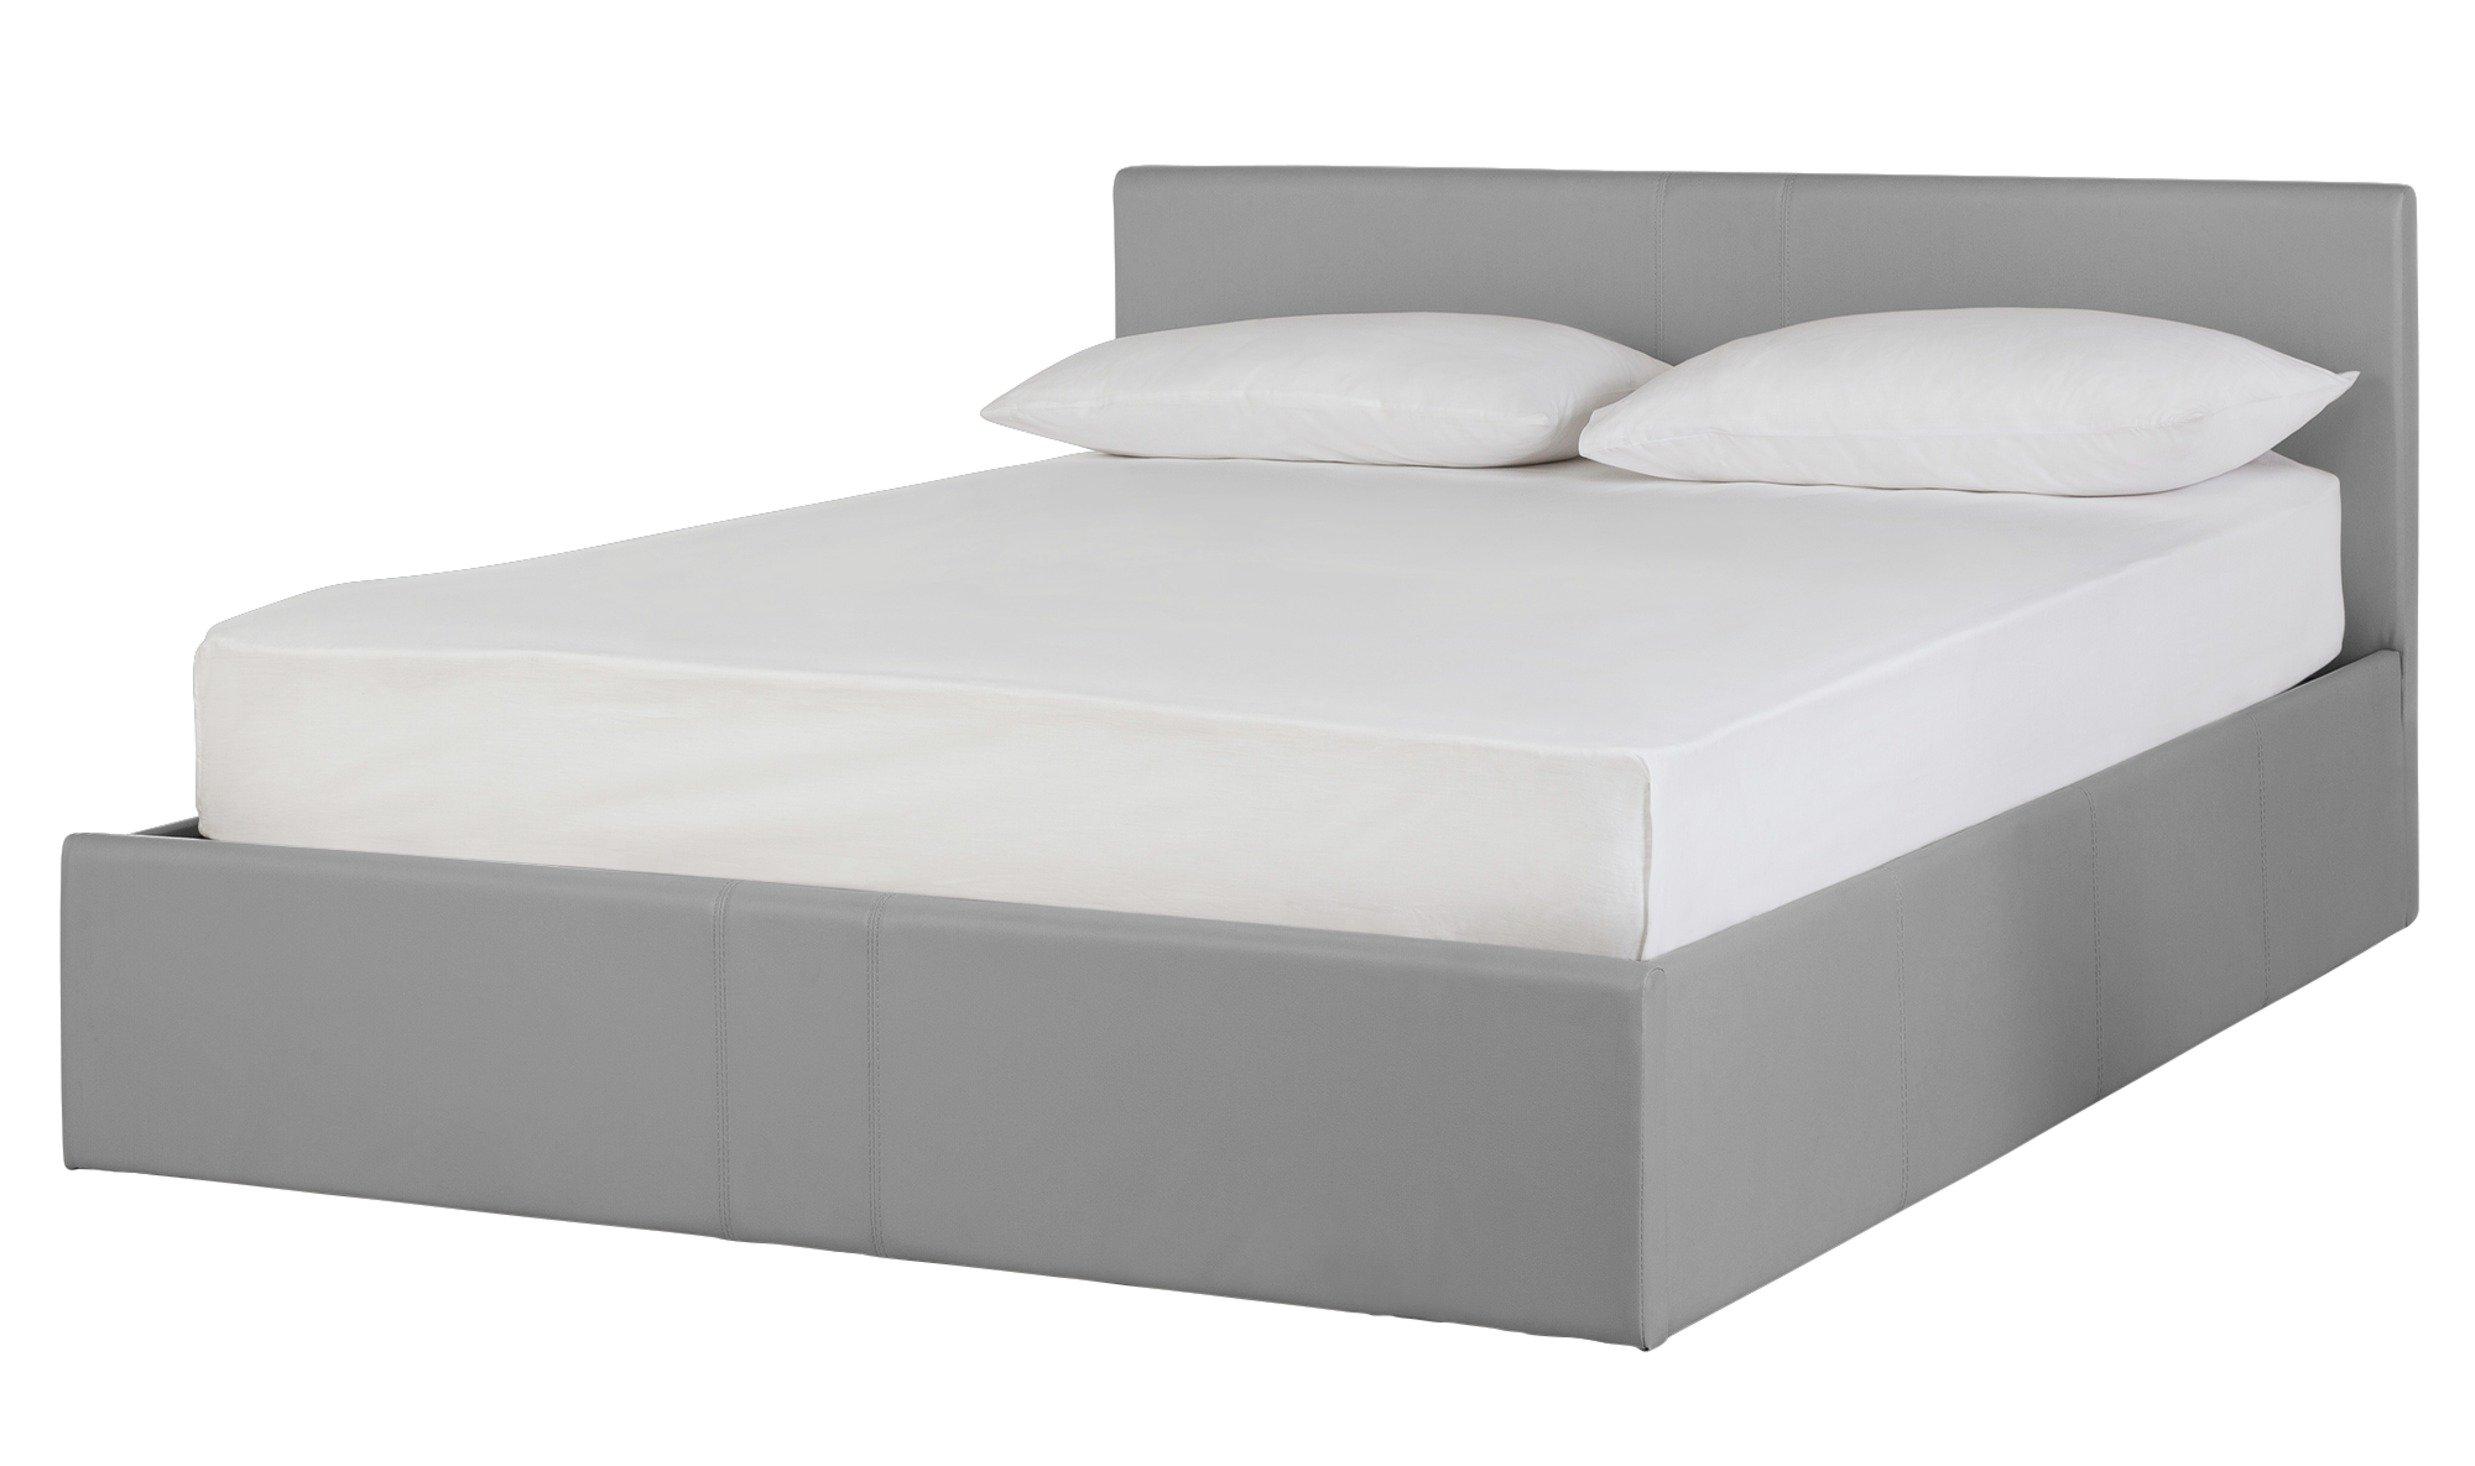 White Bed Frames bed frames | argos